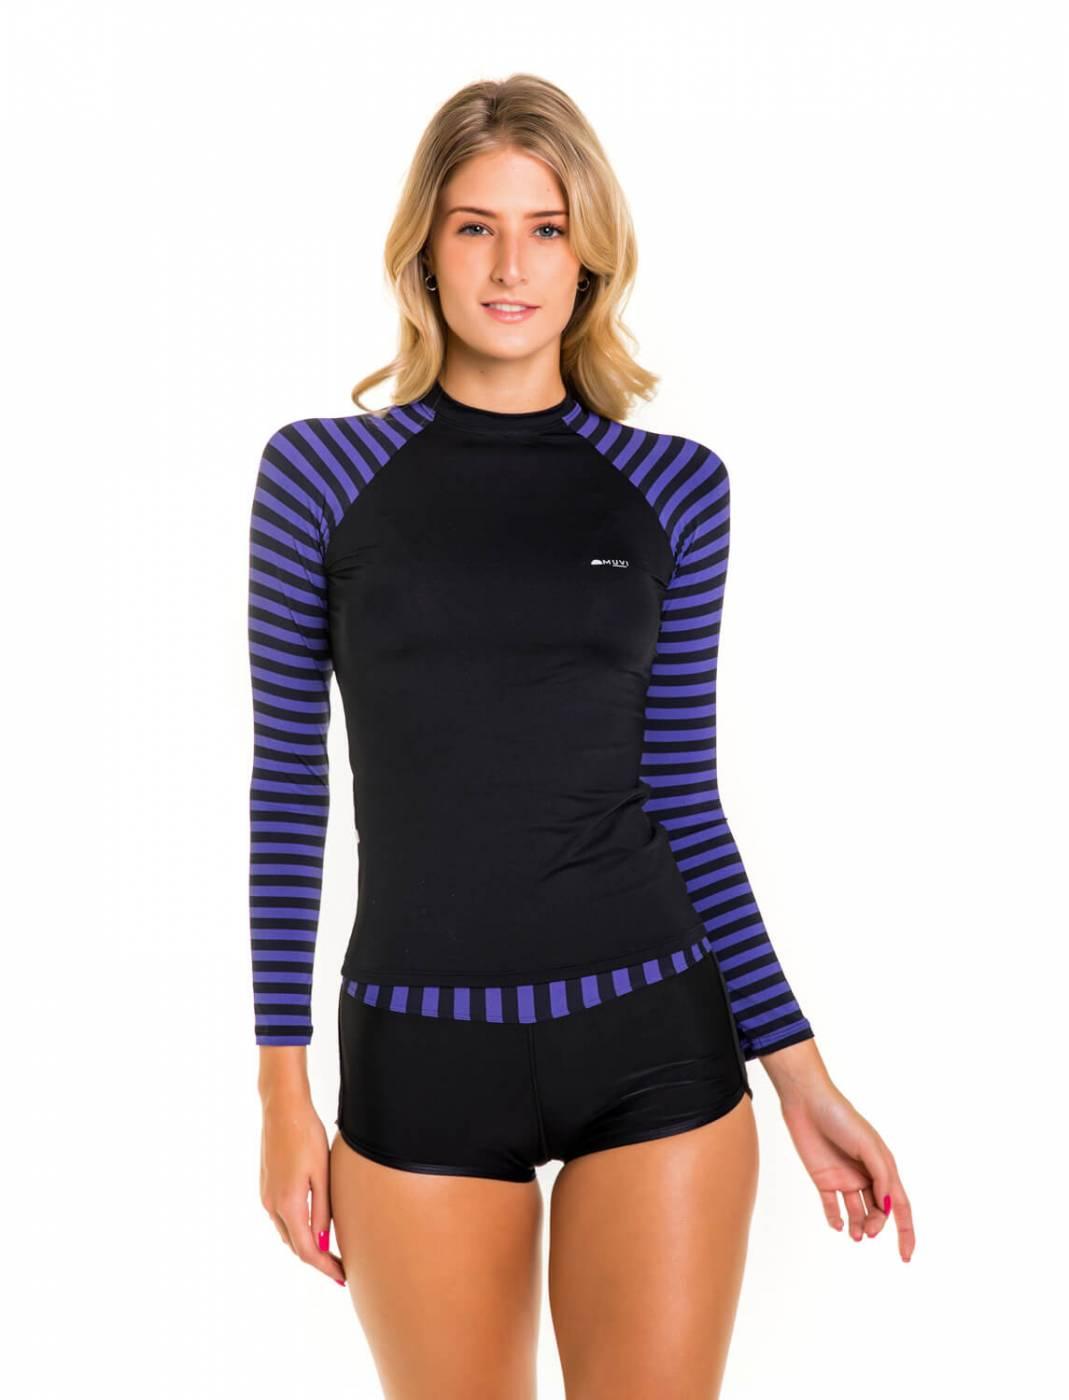 Camisa Feminina Slim Proteção Solar FPU50+ Muvi - Laguna